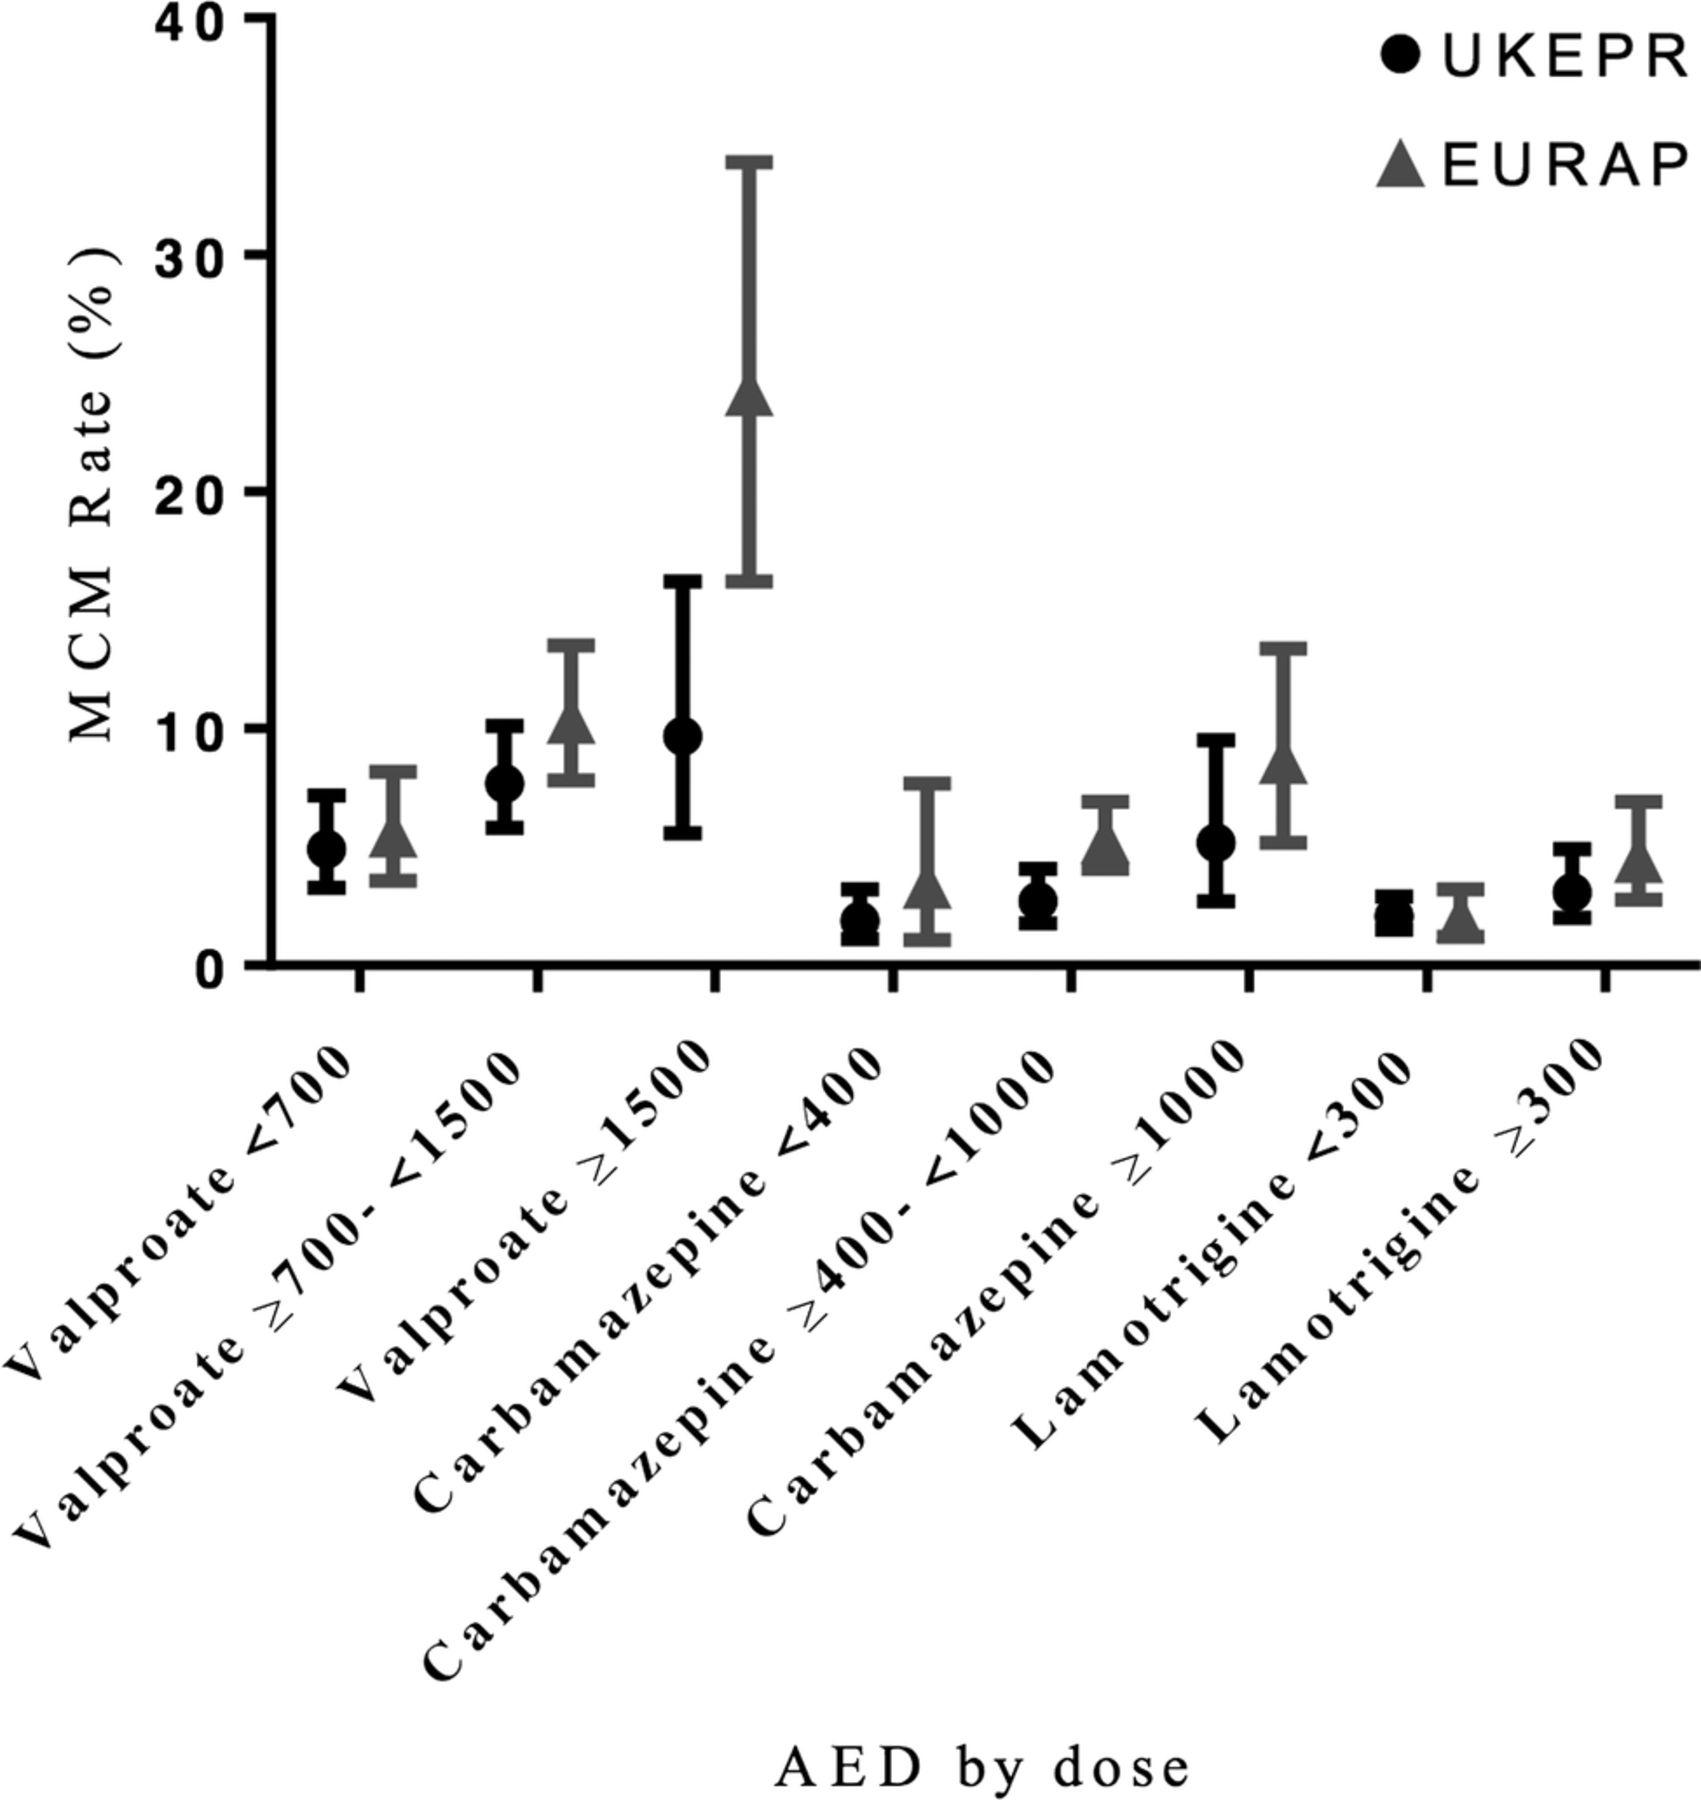 Malformation risks of antiepileptic drug monotherapies in